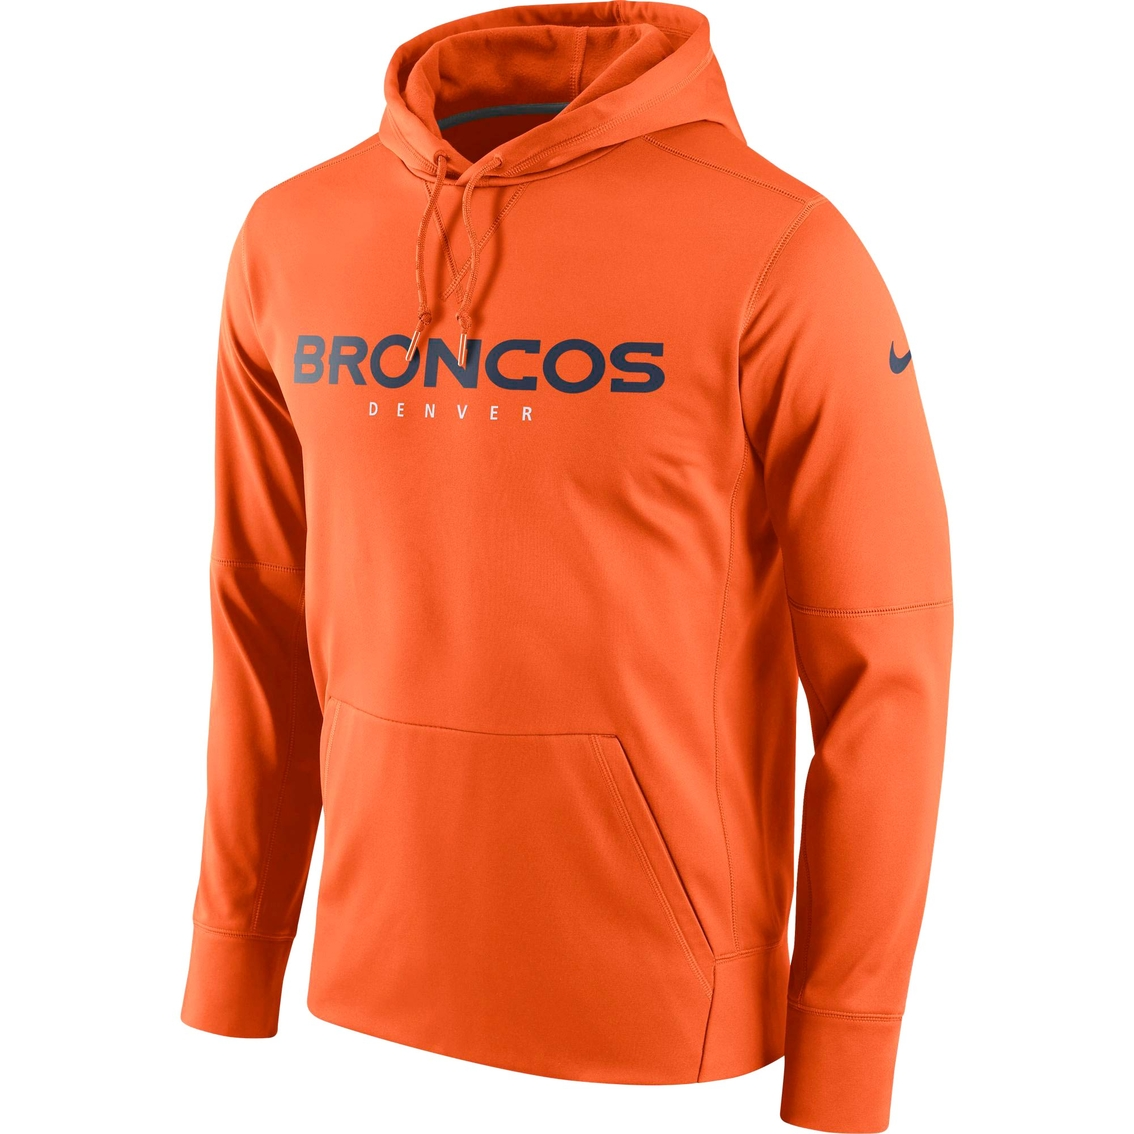 new product e3454 18a89 Denver Bronco Fleece Jacket - Famous Jacket 2018